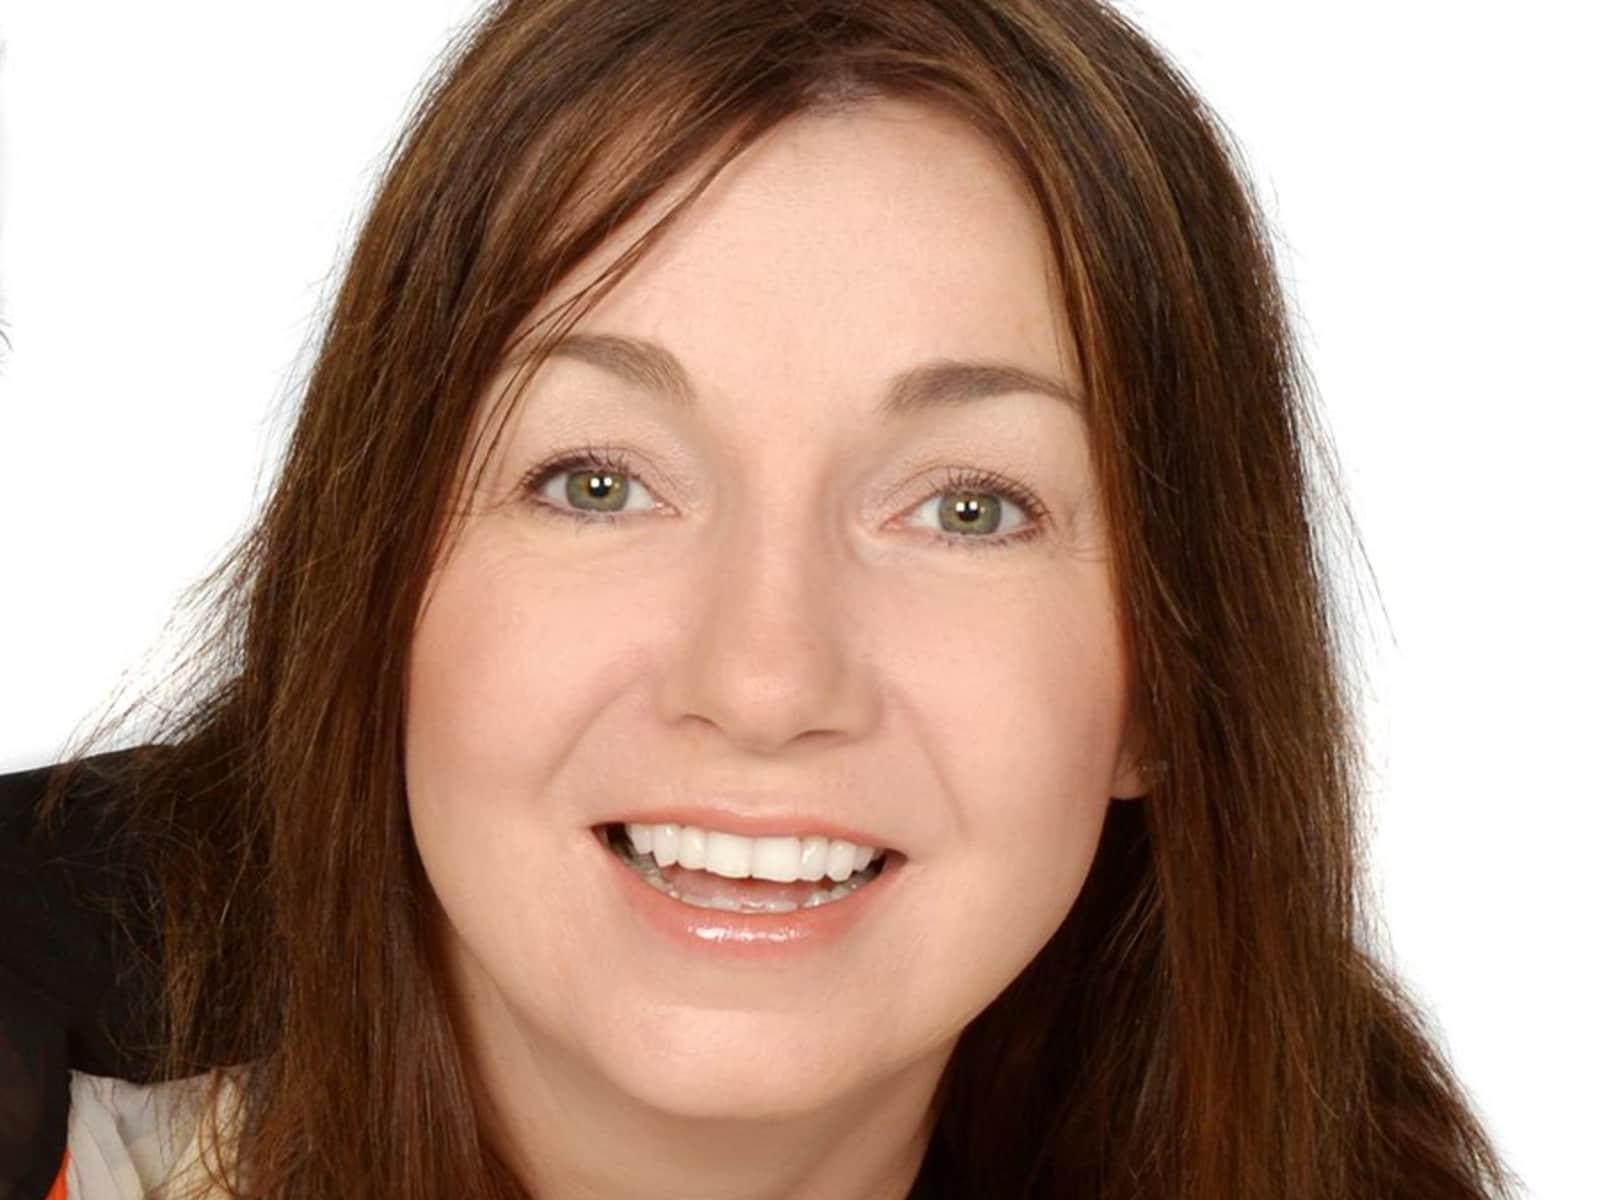 Renee from Hessle, United Kingdom